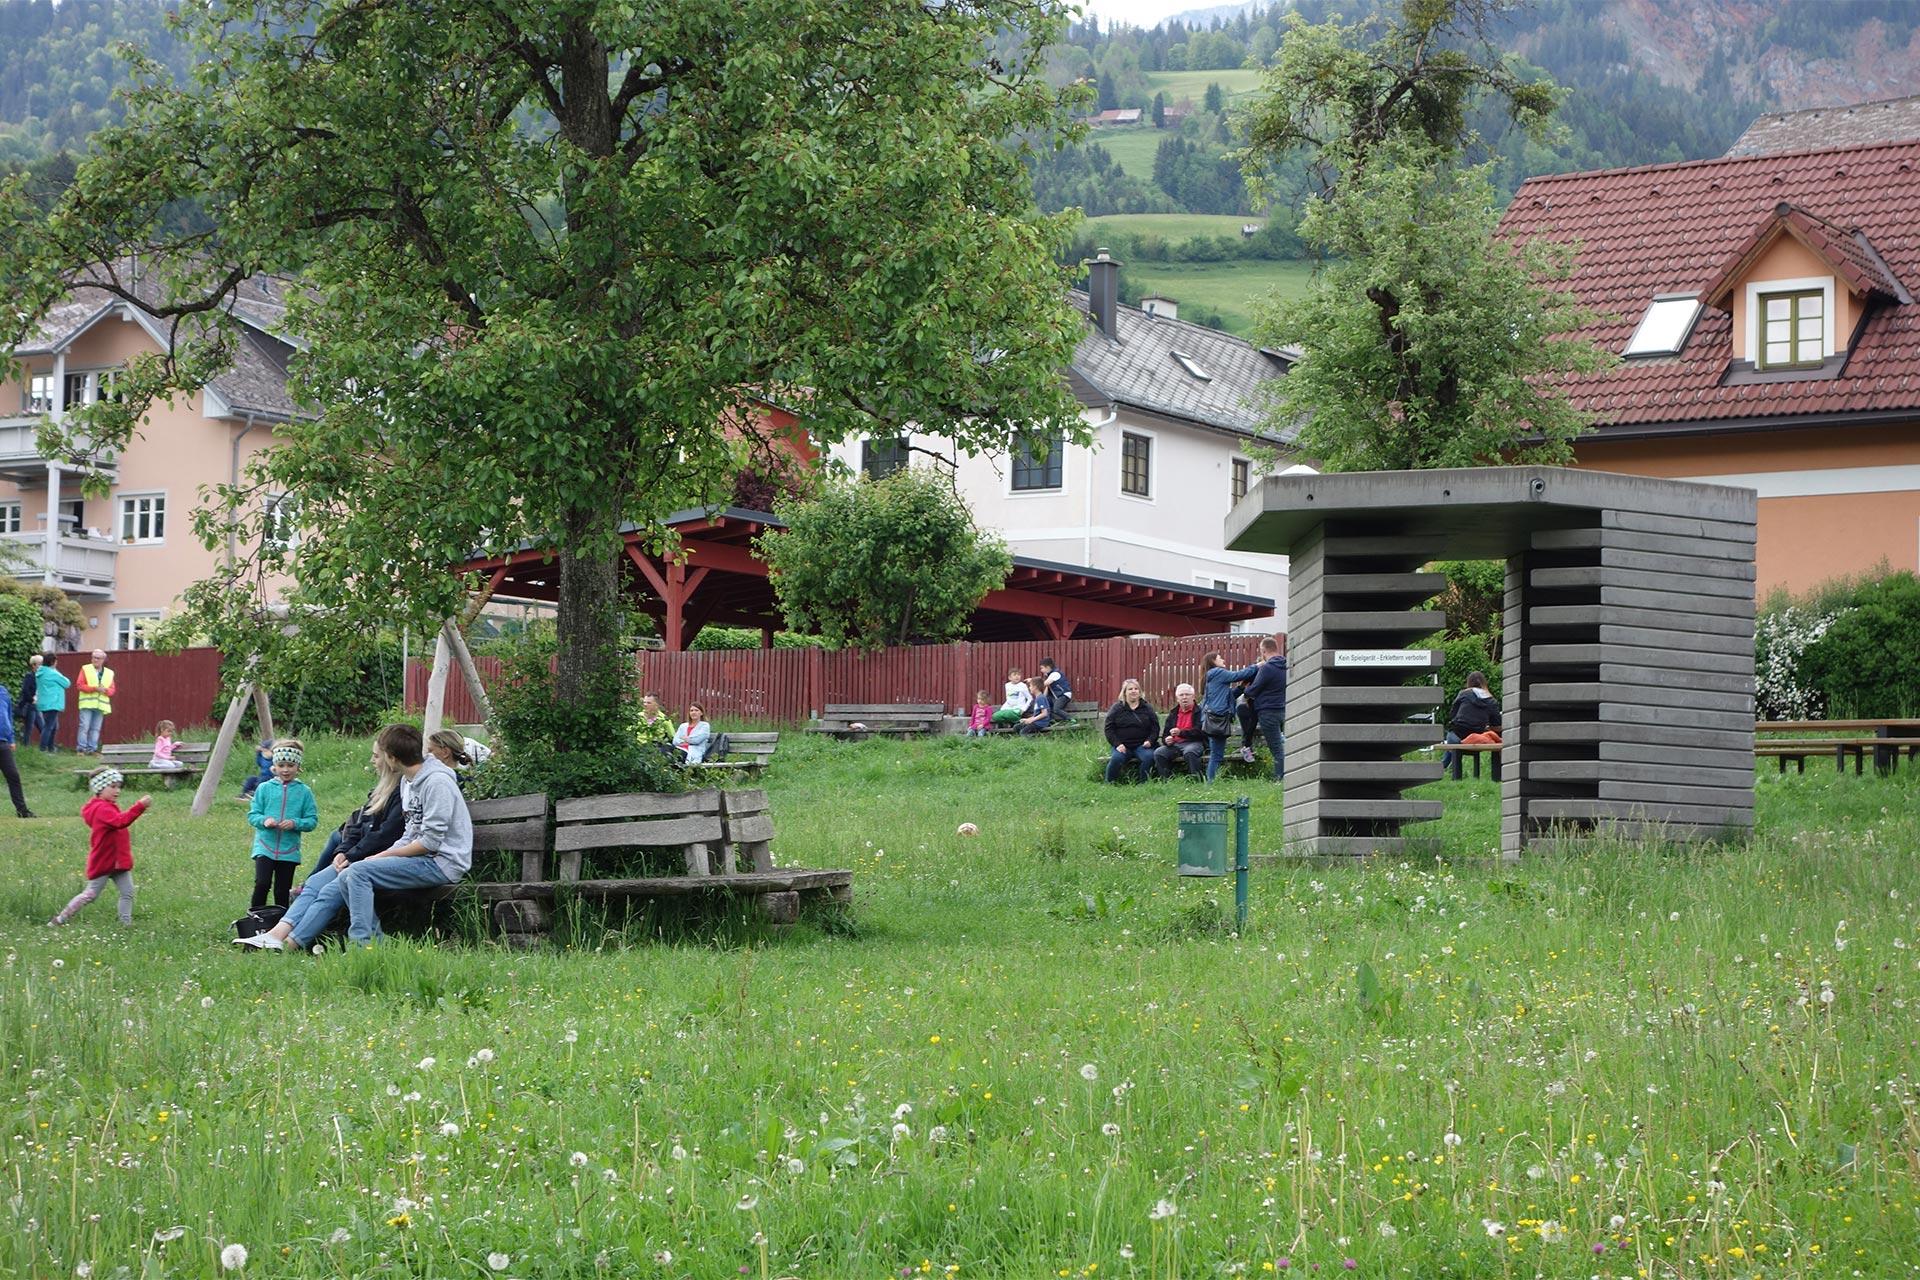 Commons Come to Liezen